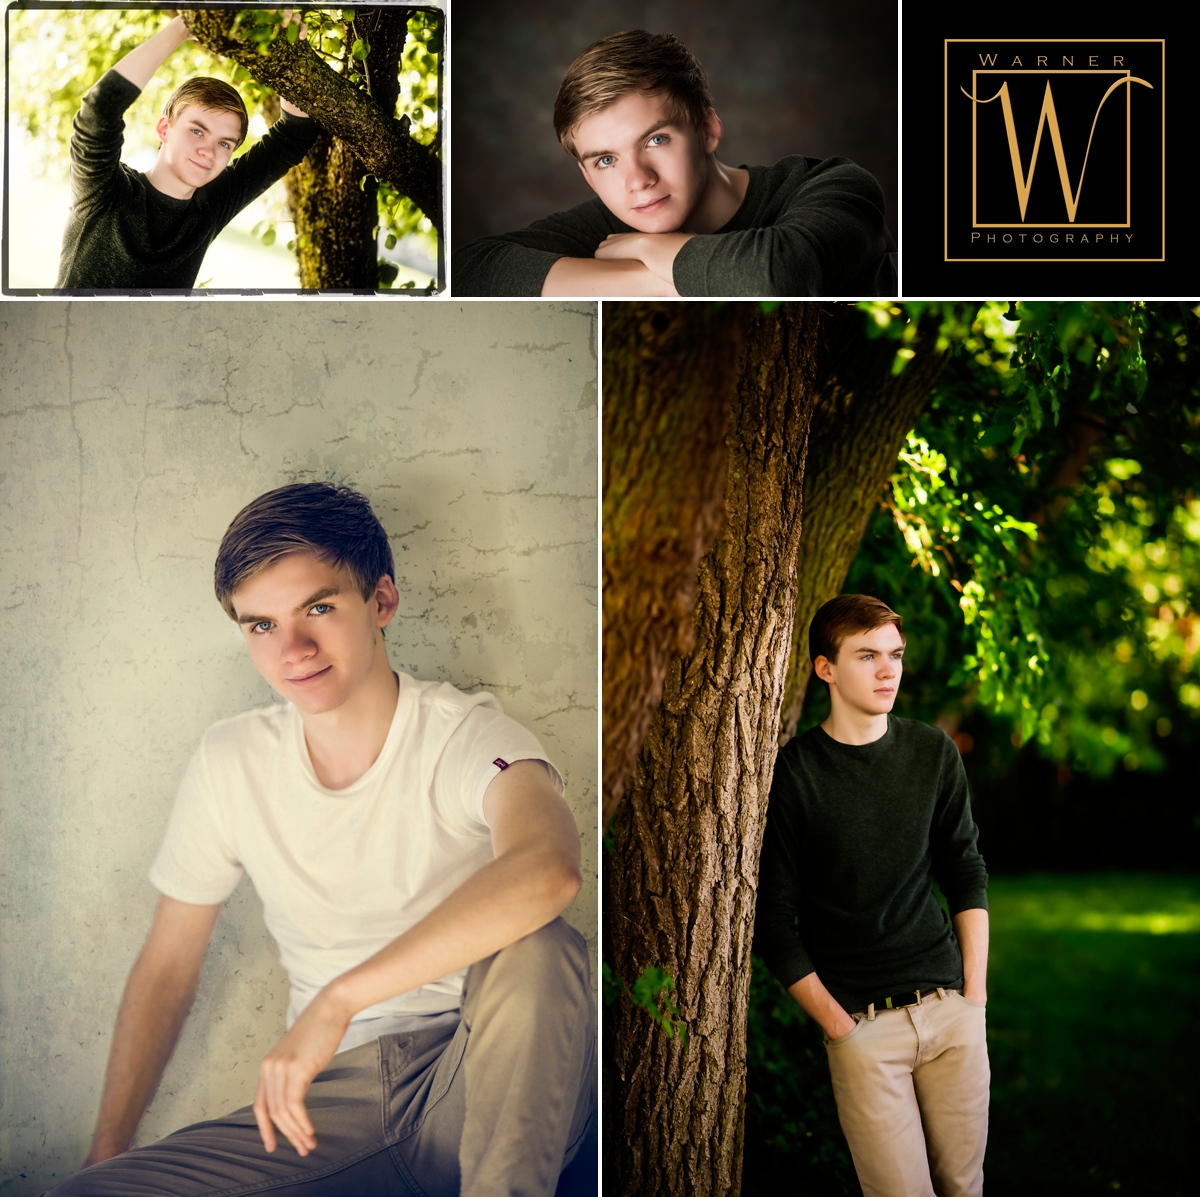 Adam Senior Collage photos by Warner Photography in Midland Michigan